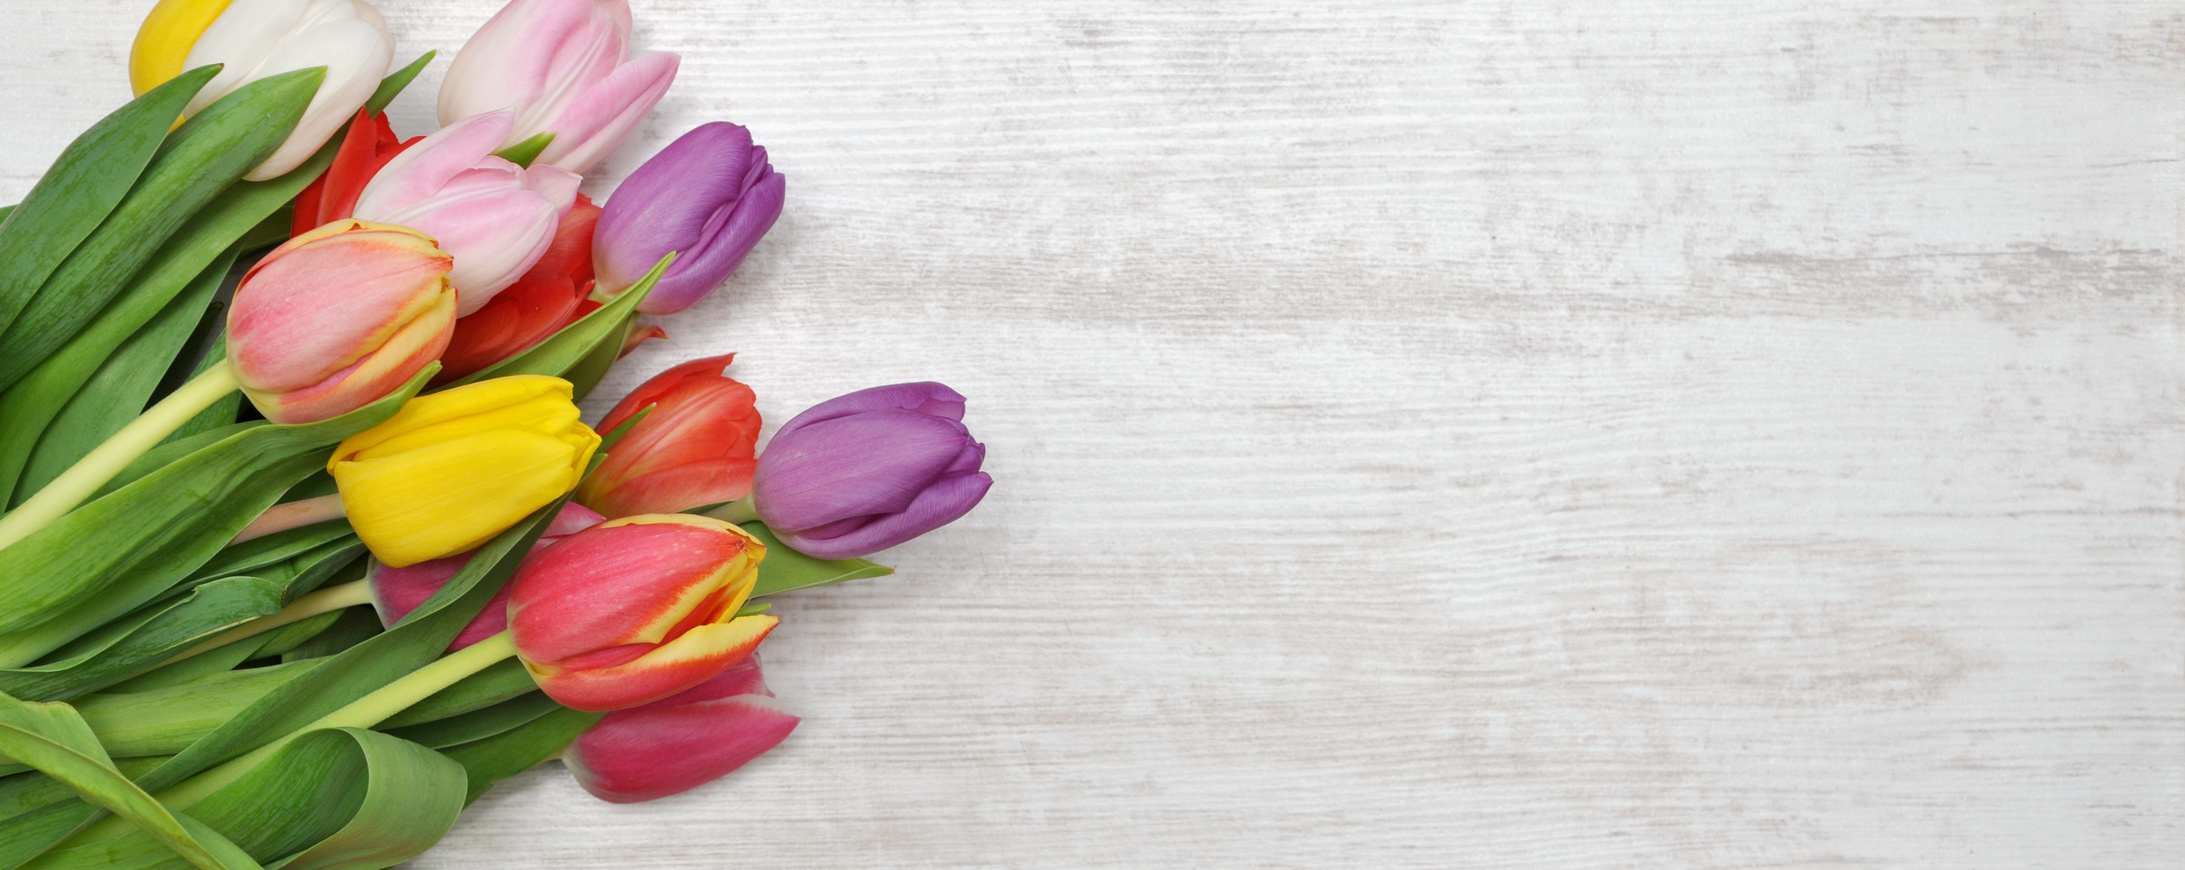 Hintergrund Tulpen